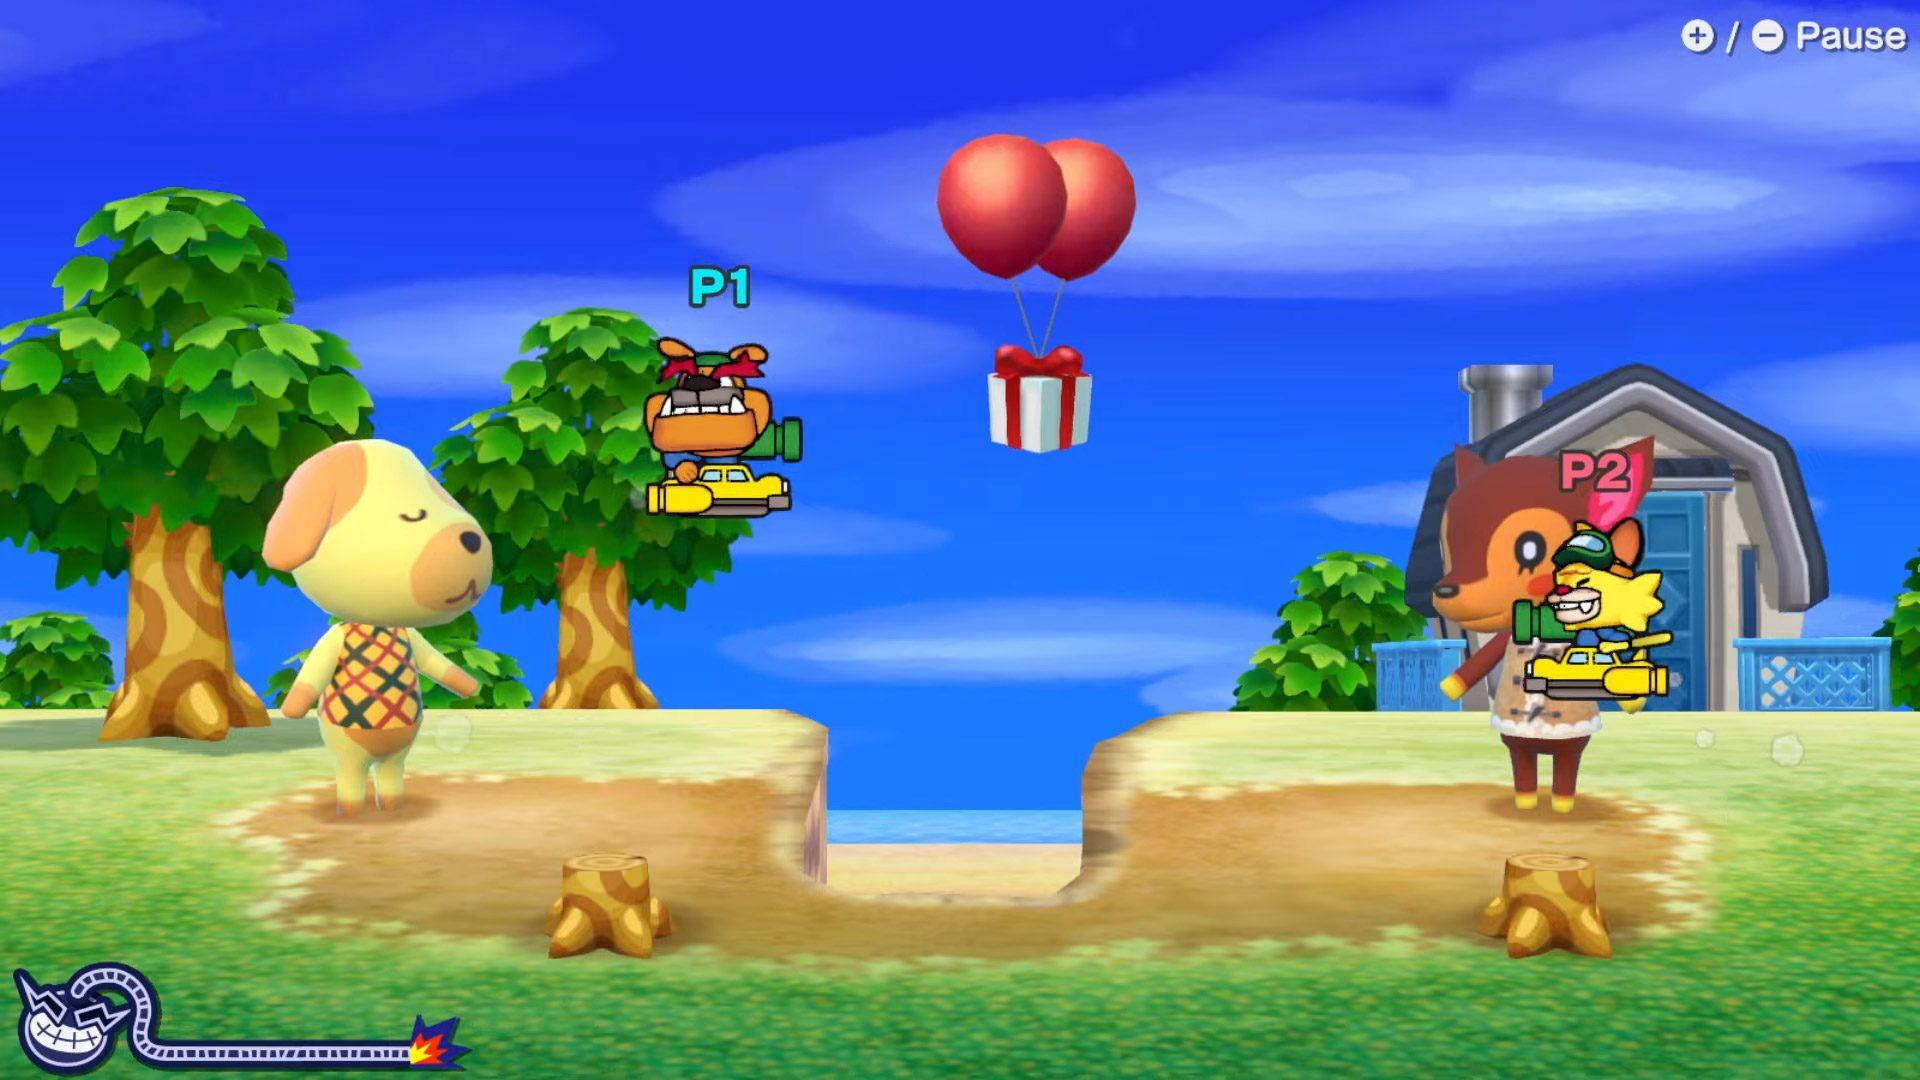 Animal Crossing in WarioWare: Get It Together